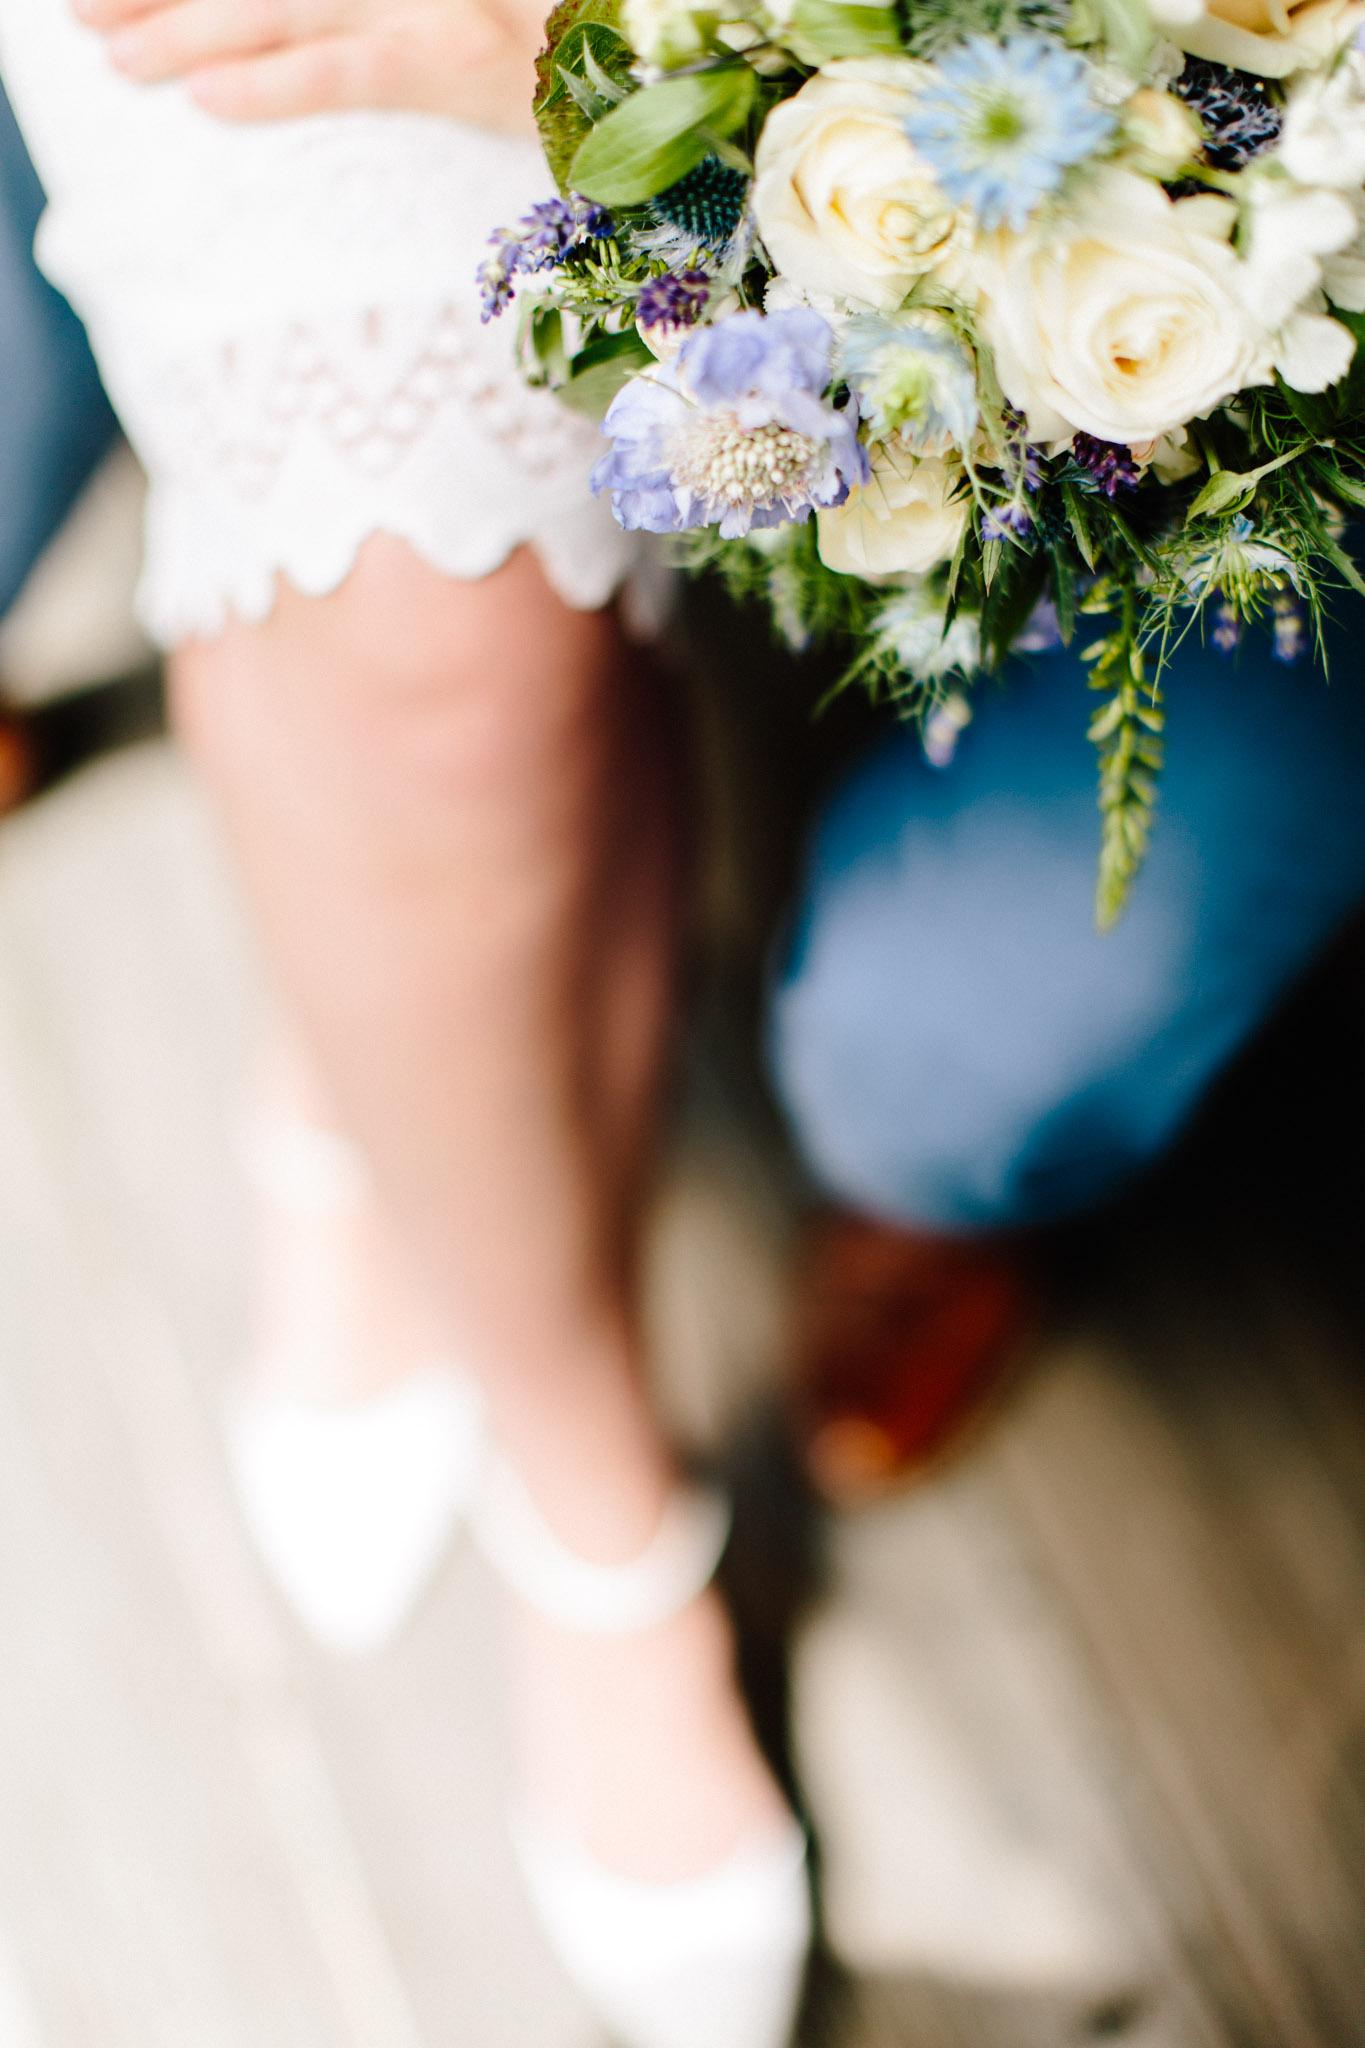 Lenl-Simmental-Buehlerhof-Pia-Anna-Christian-Wedding-Photography-EK-45.jpg